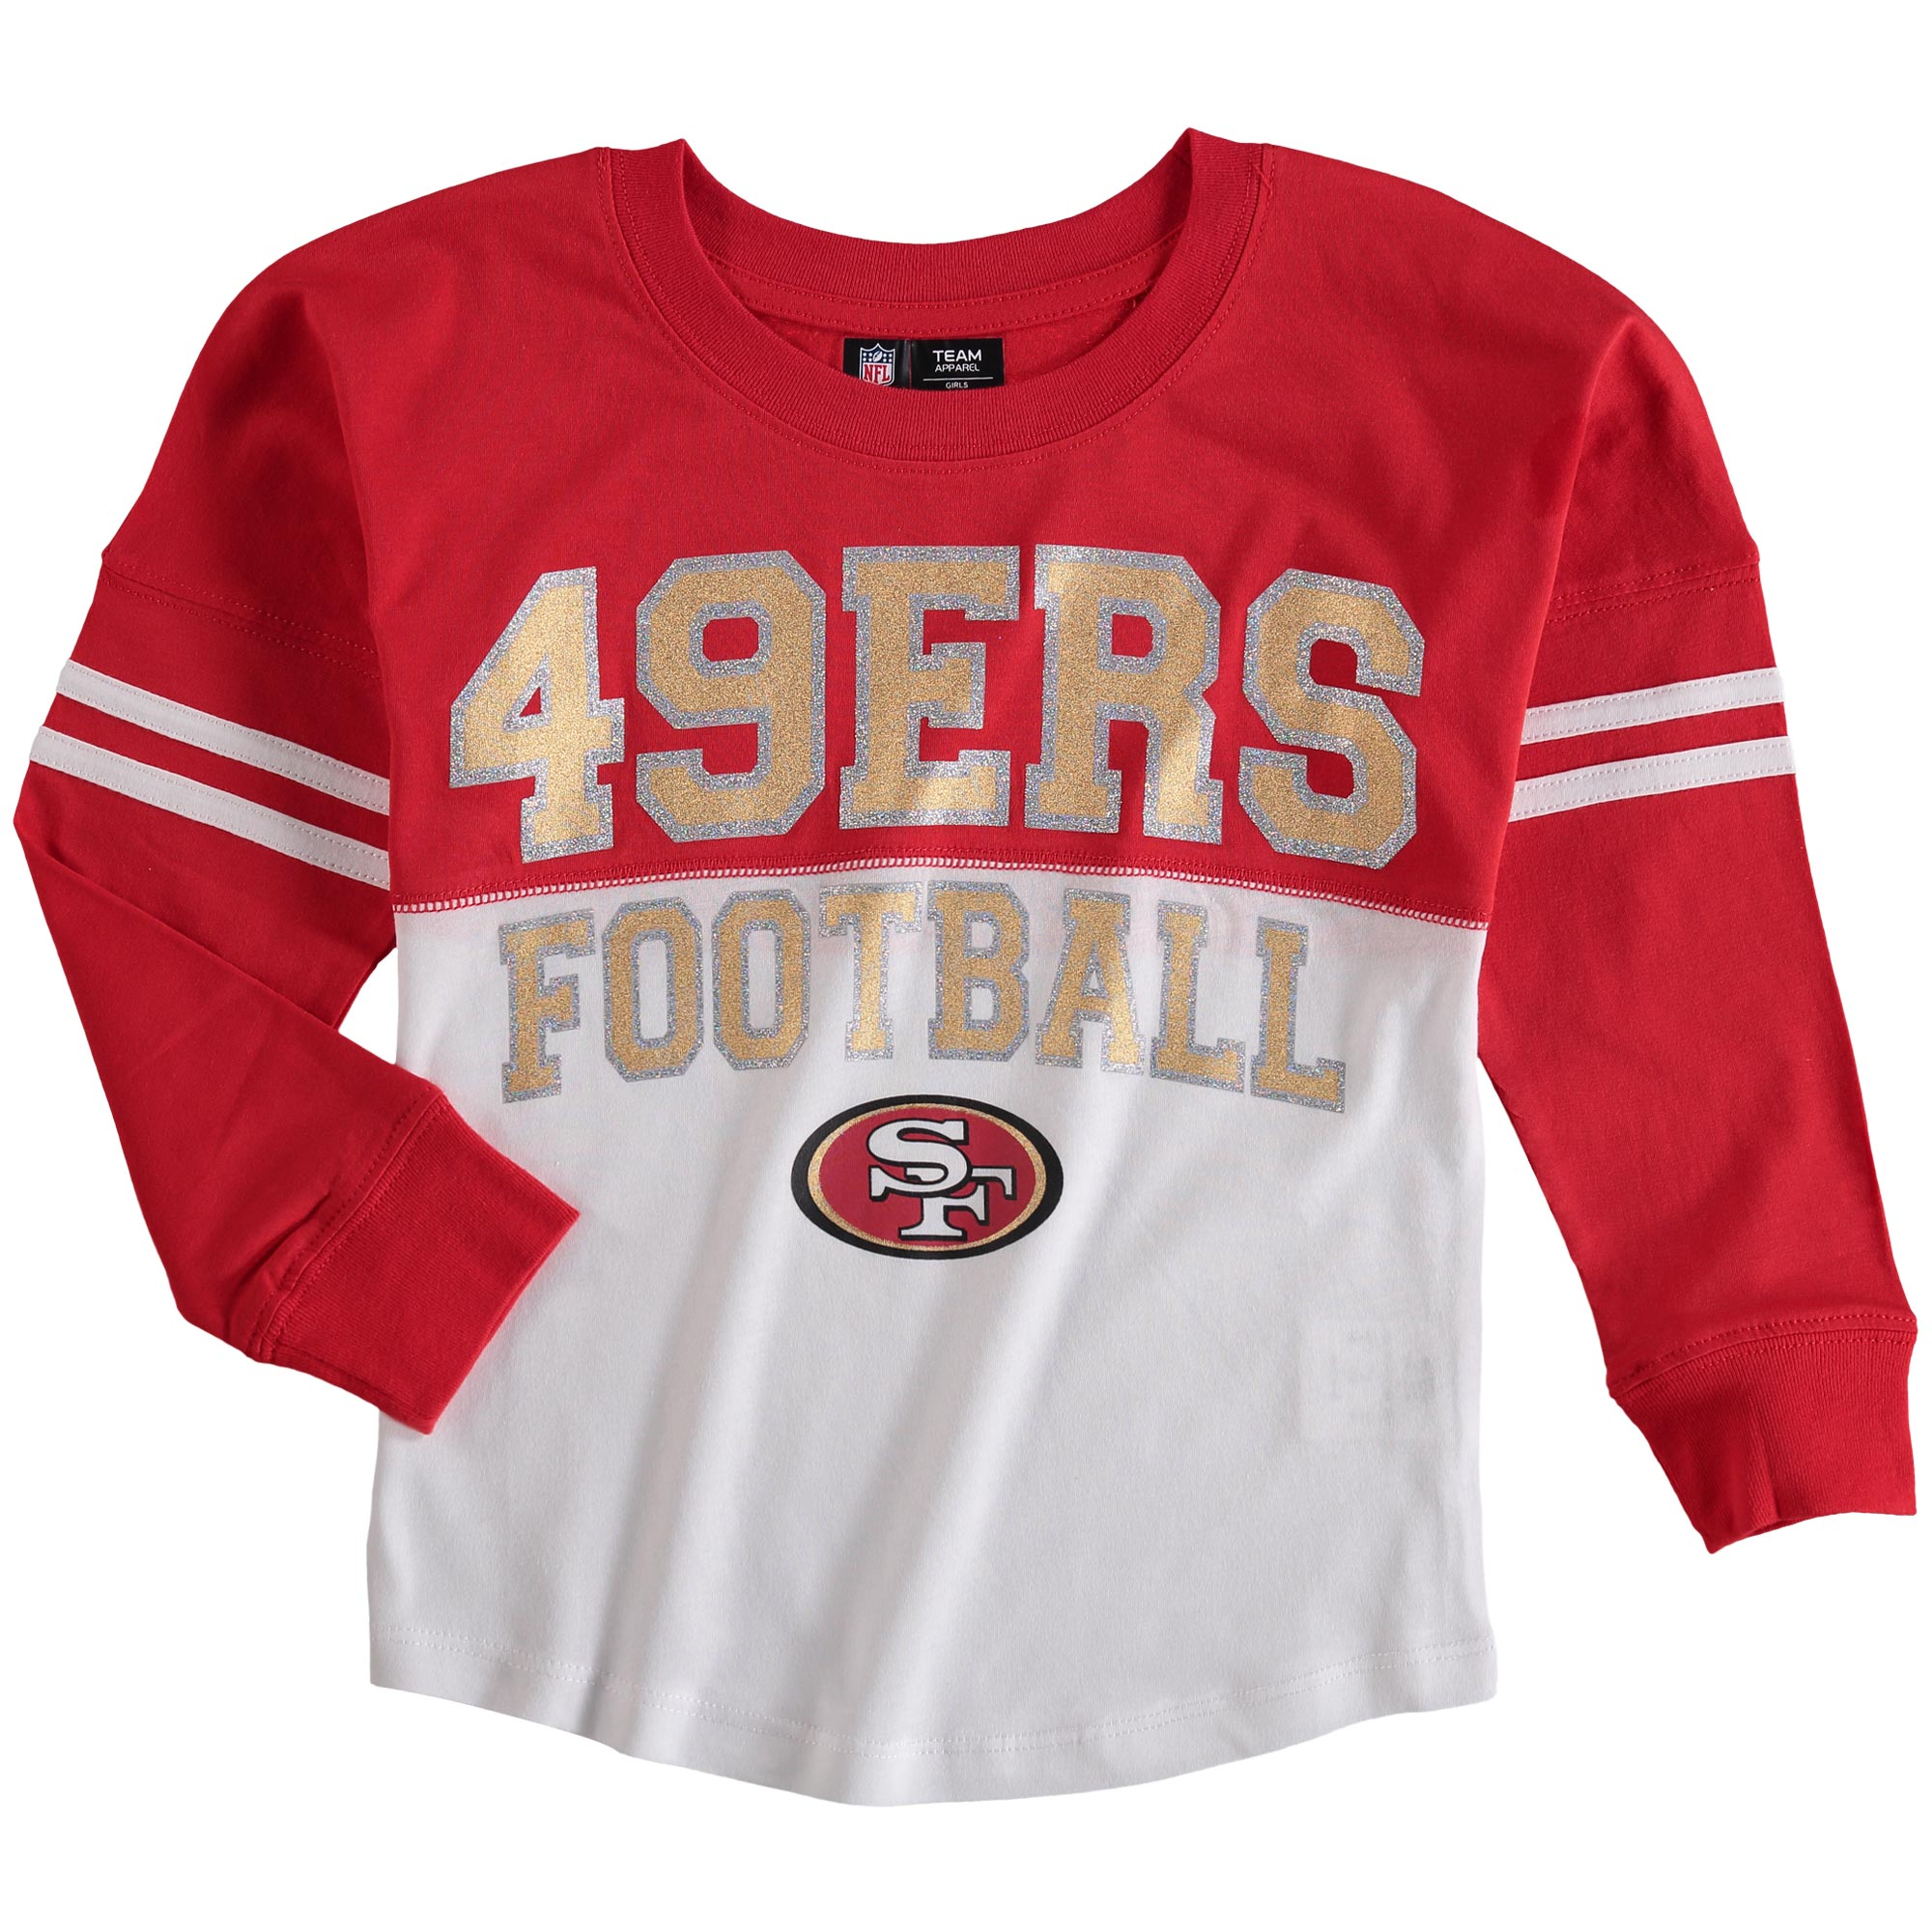 San Francisco 49ers 5th & Ocean by New Era Girls Youth Varsity Long Sleeve T-Shirt - White/Scarlet